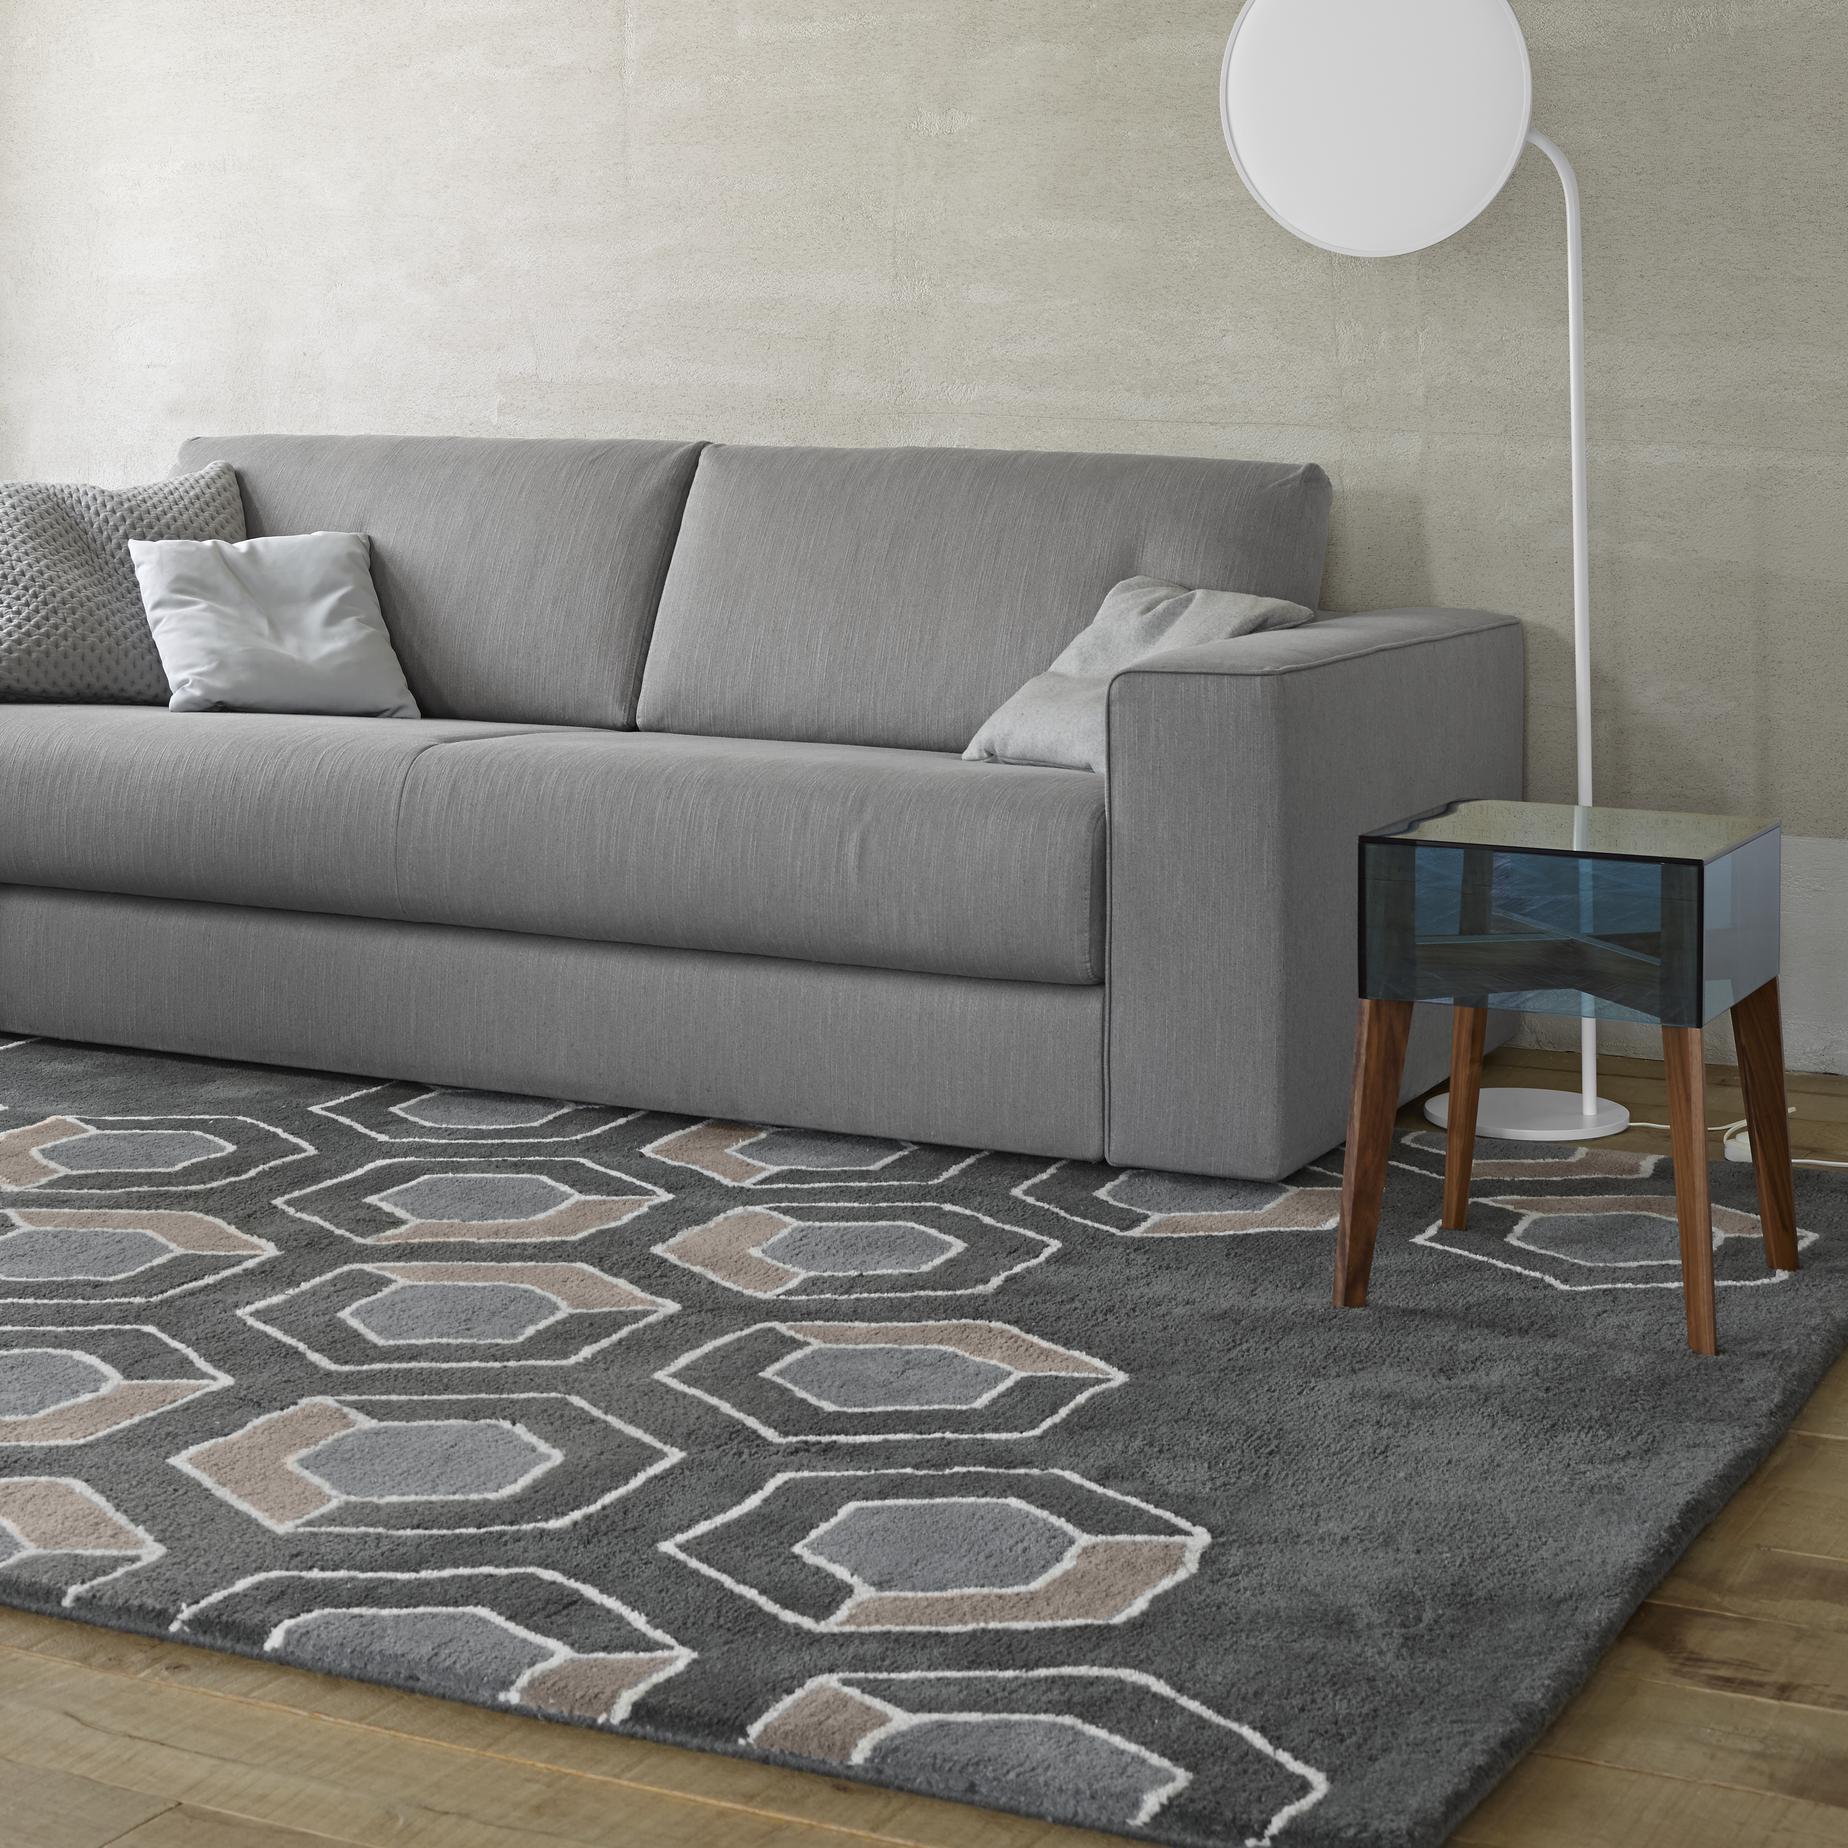 hix cloud tapis du designer studio catoir ligne roset site officiel. Black Bedroom Furniture Sets. Home Design Ideas